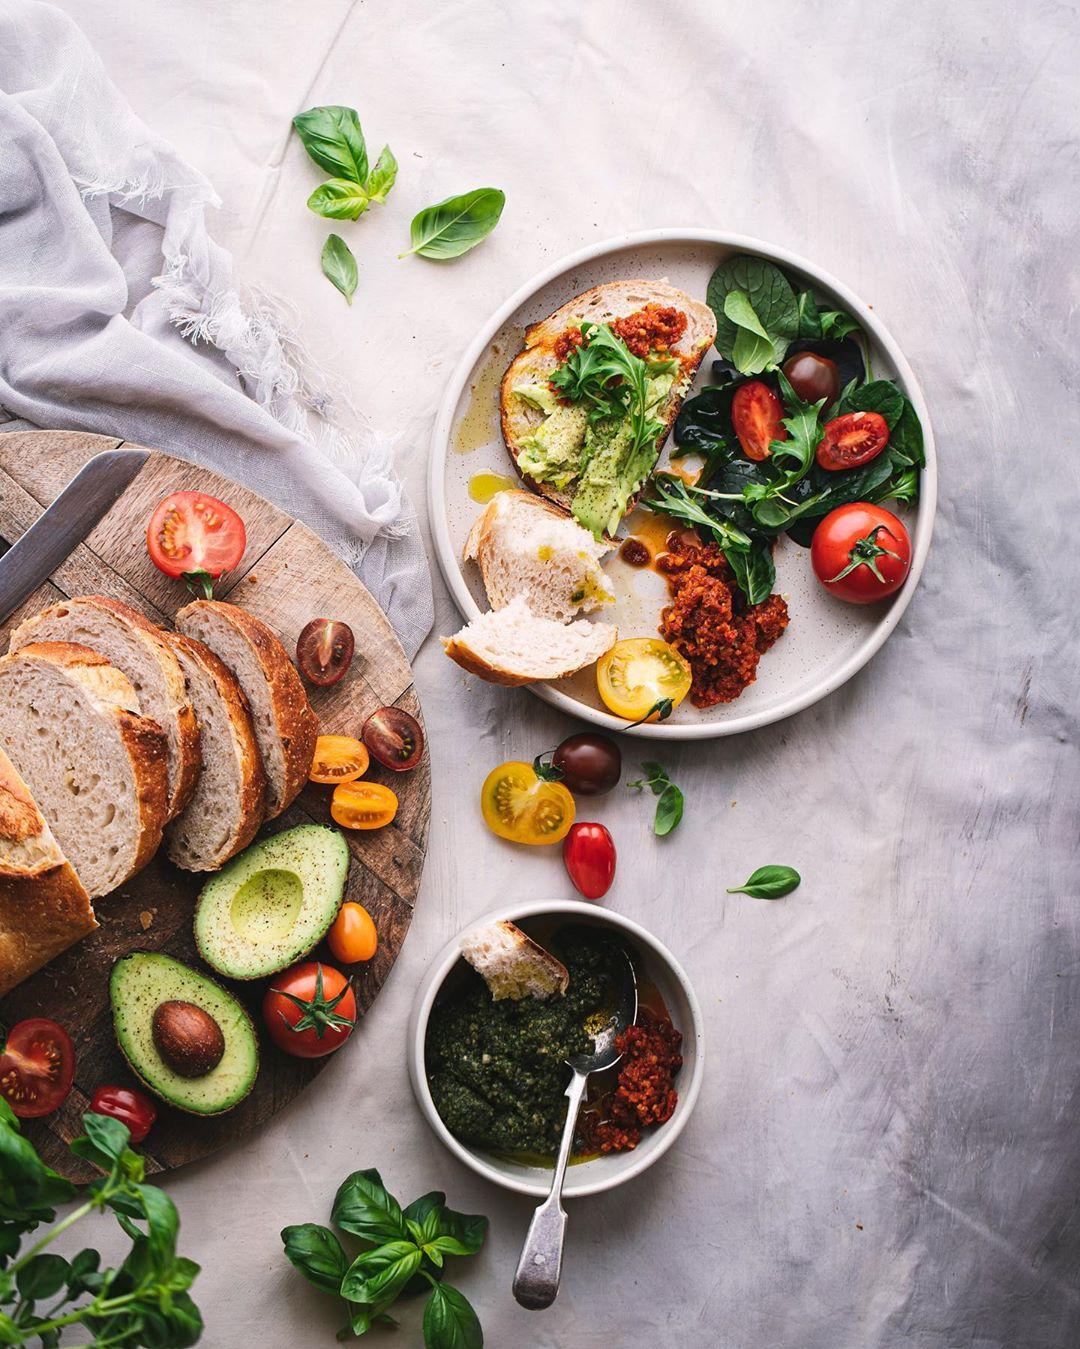 breakfast platter with bread, pesto, avocado, tomato and spinachs